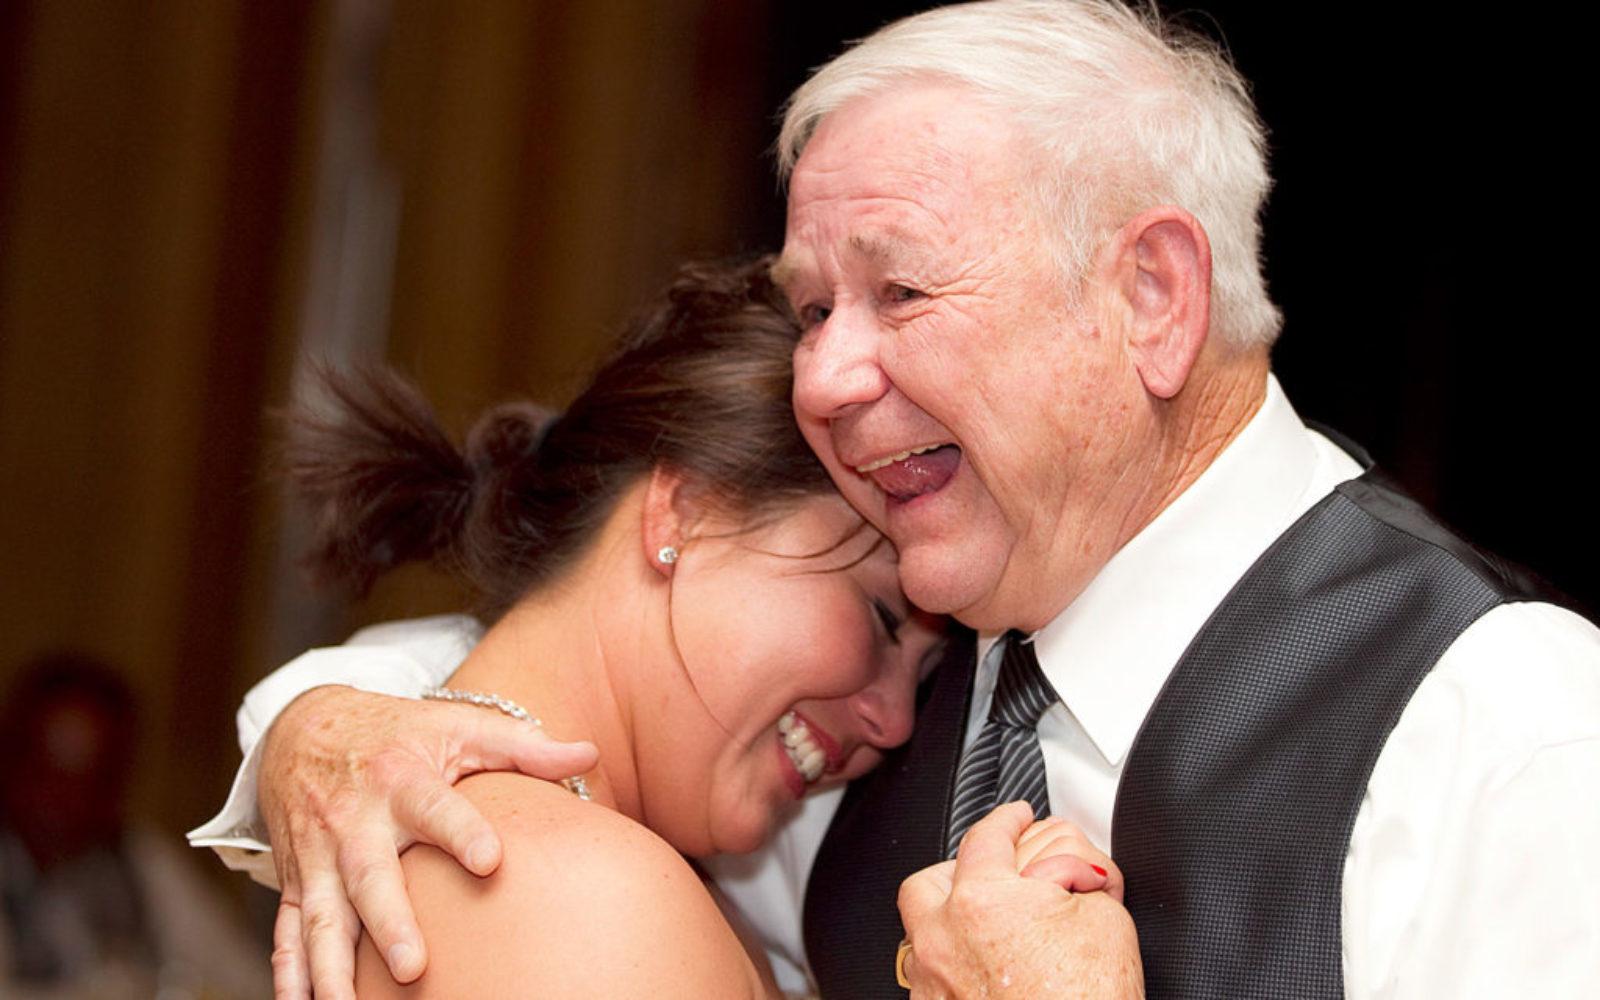 weddingphotographycoloradosprings_63-1024x640